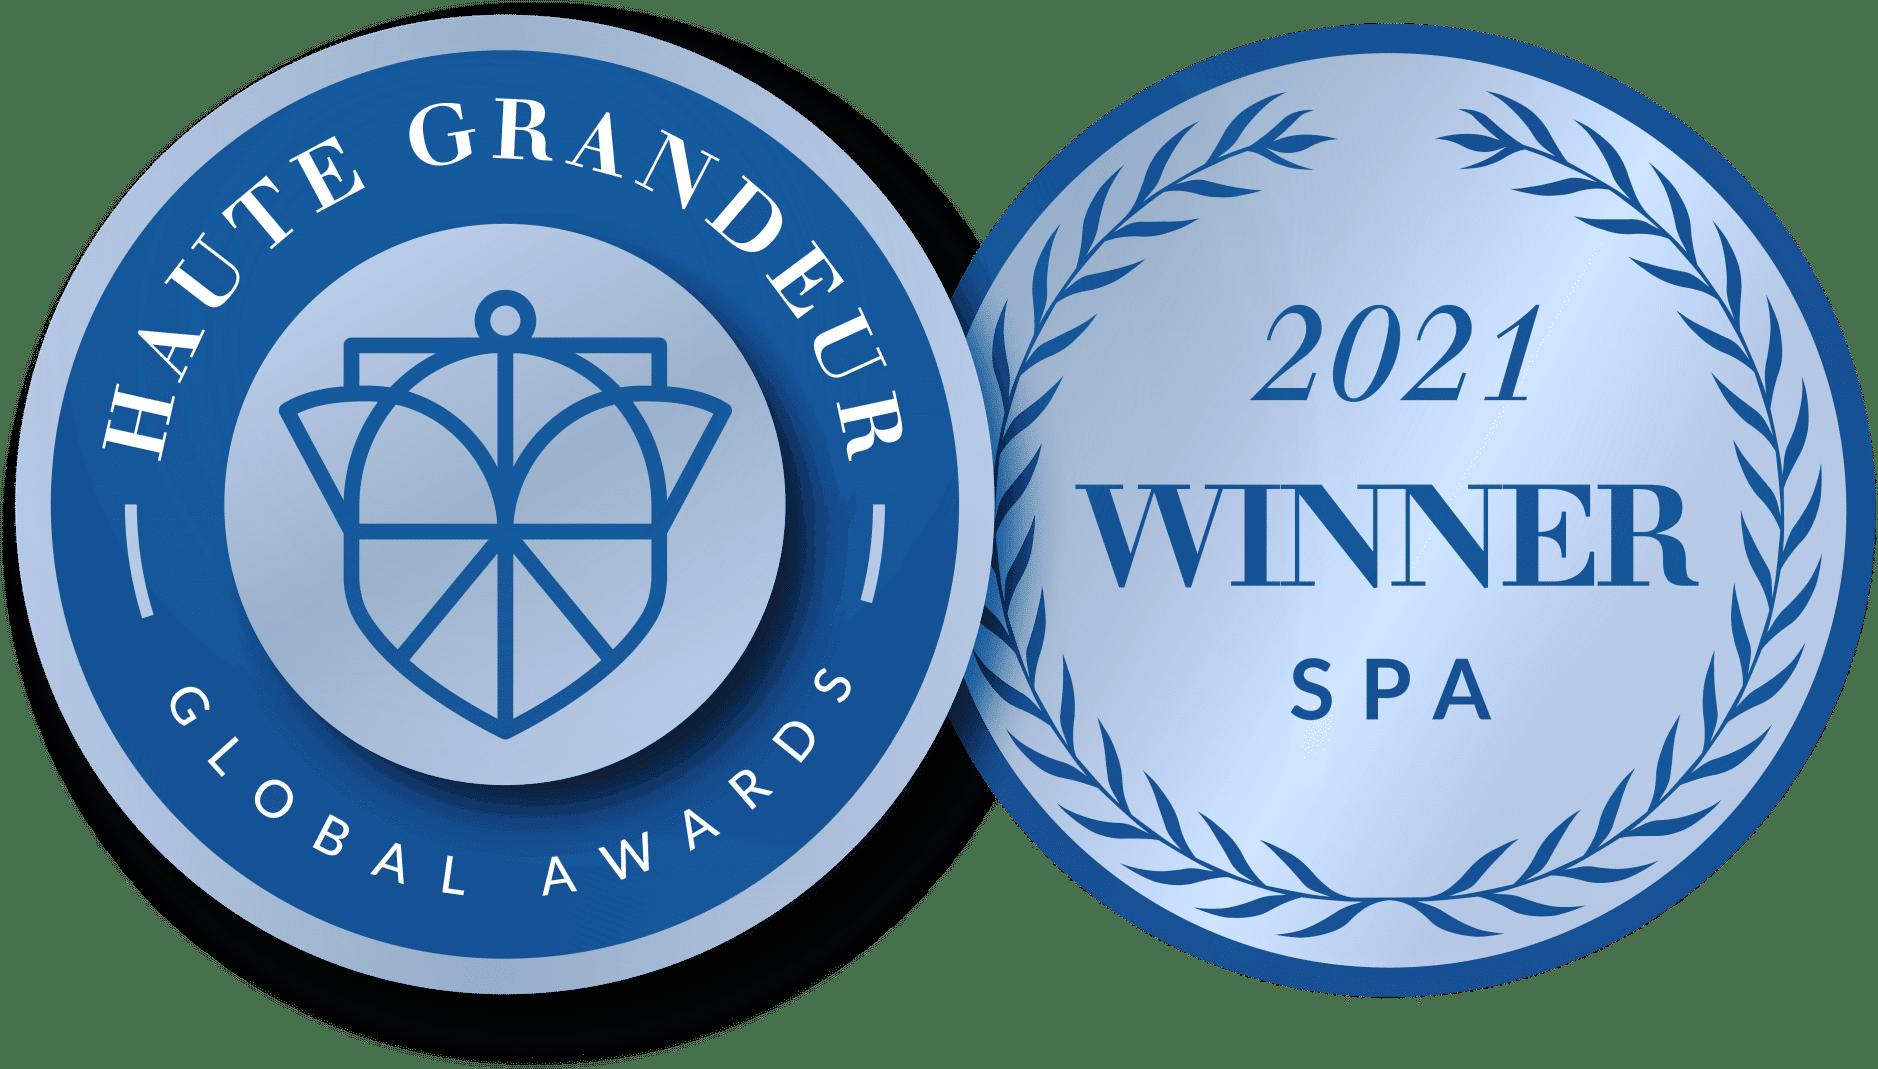 Haute Grandeur Award 2021 - Winner Spa